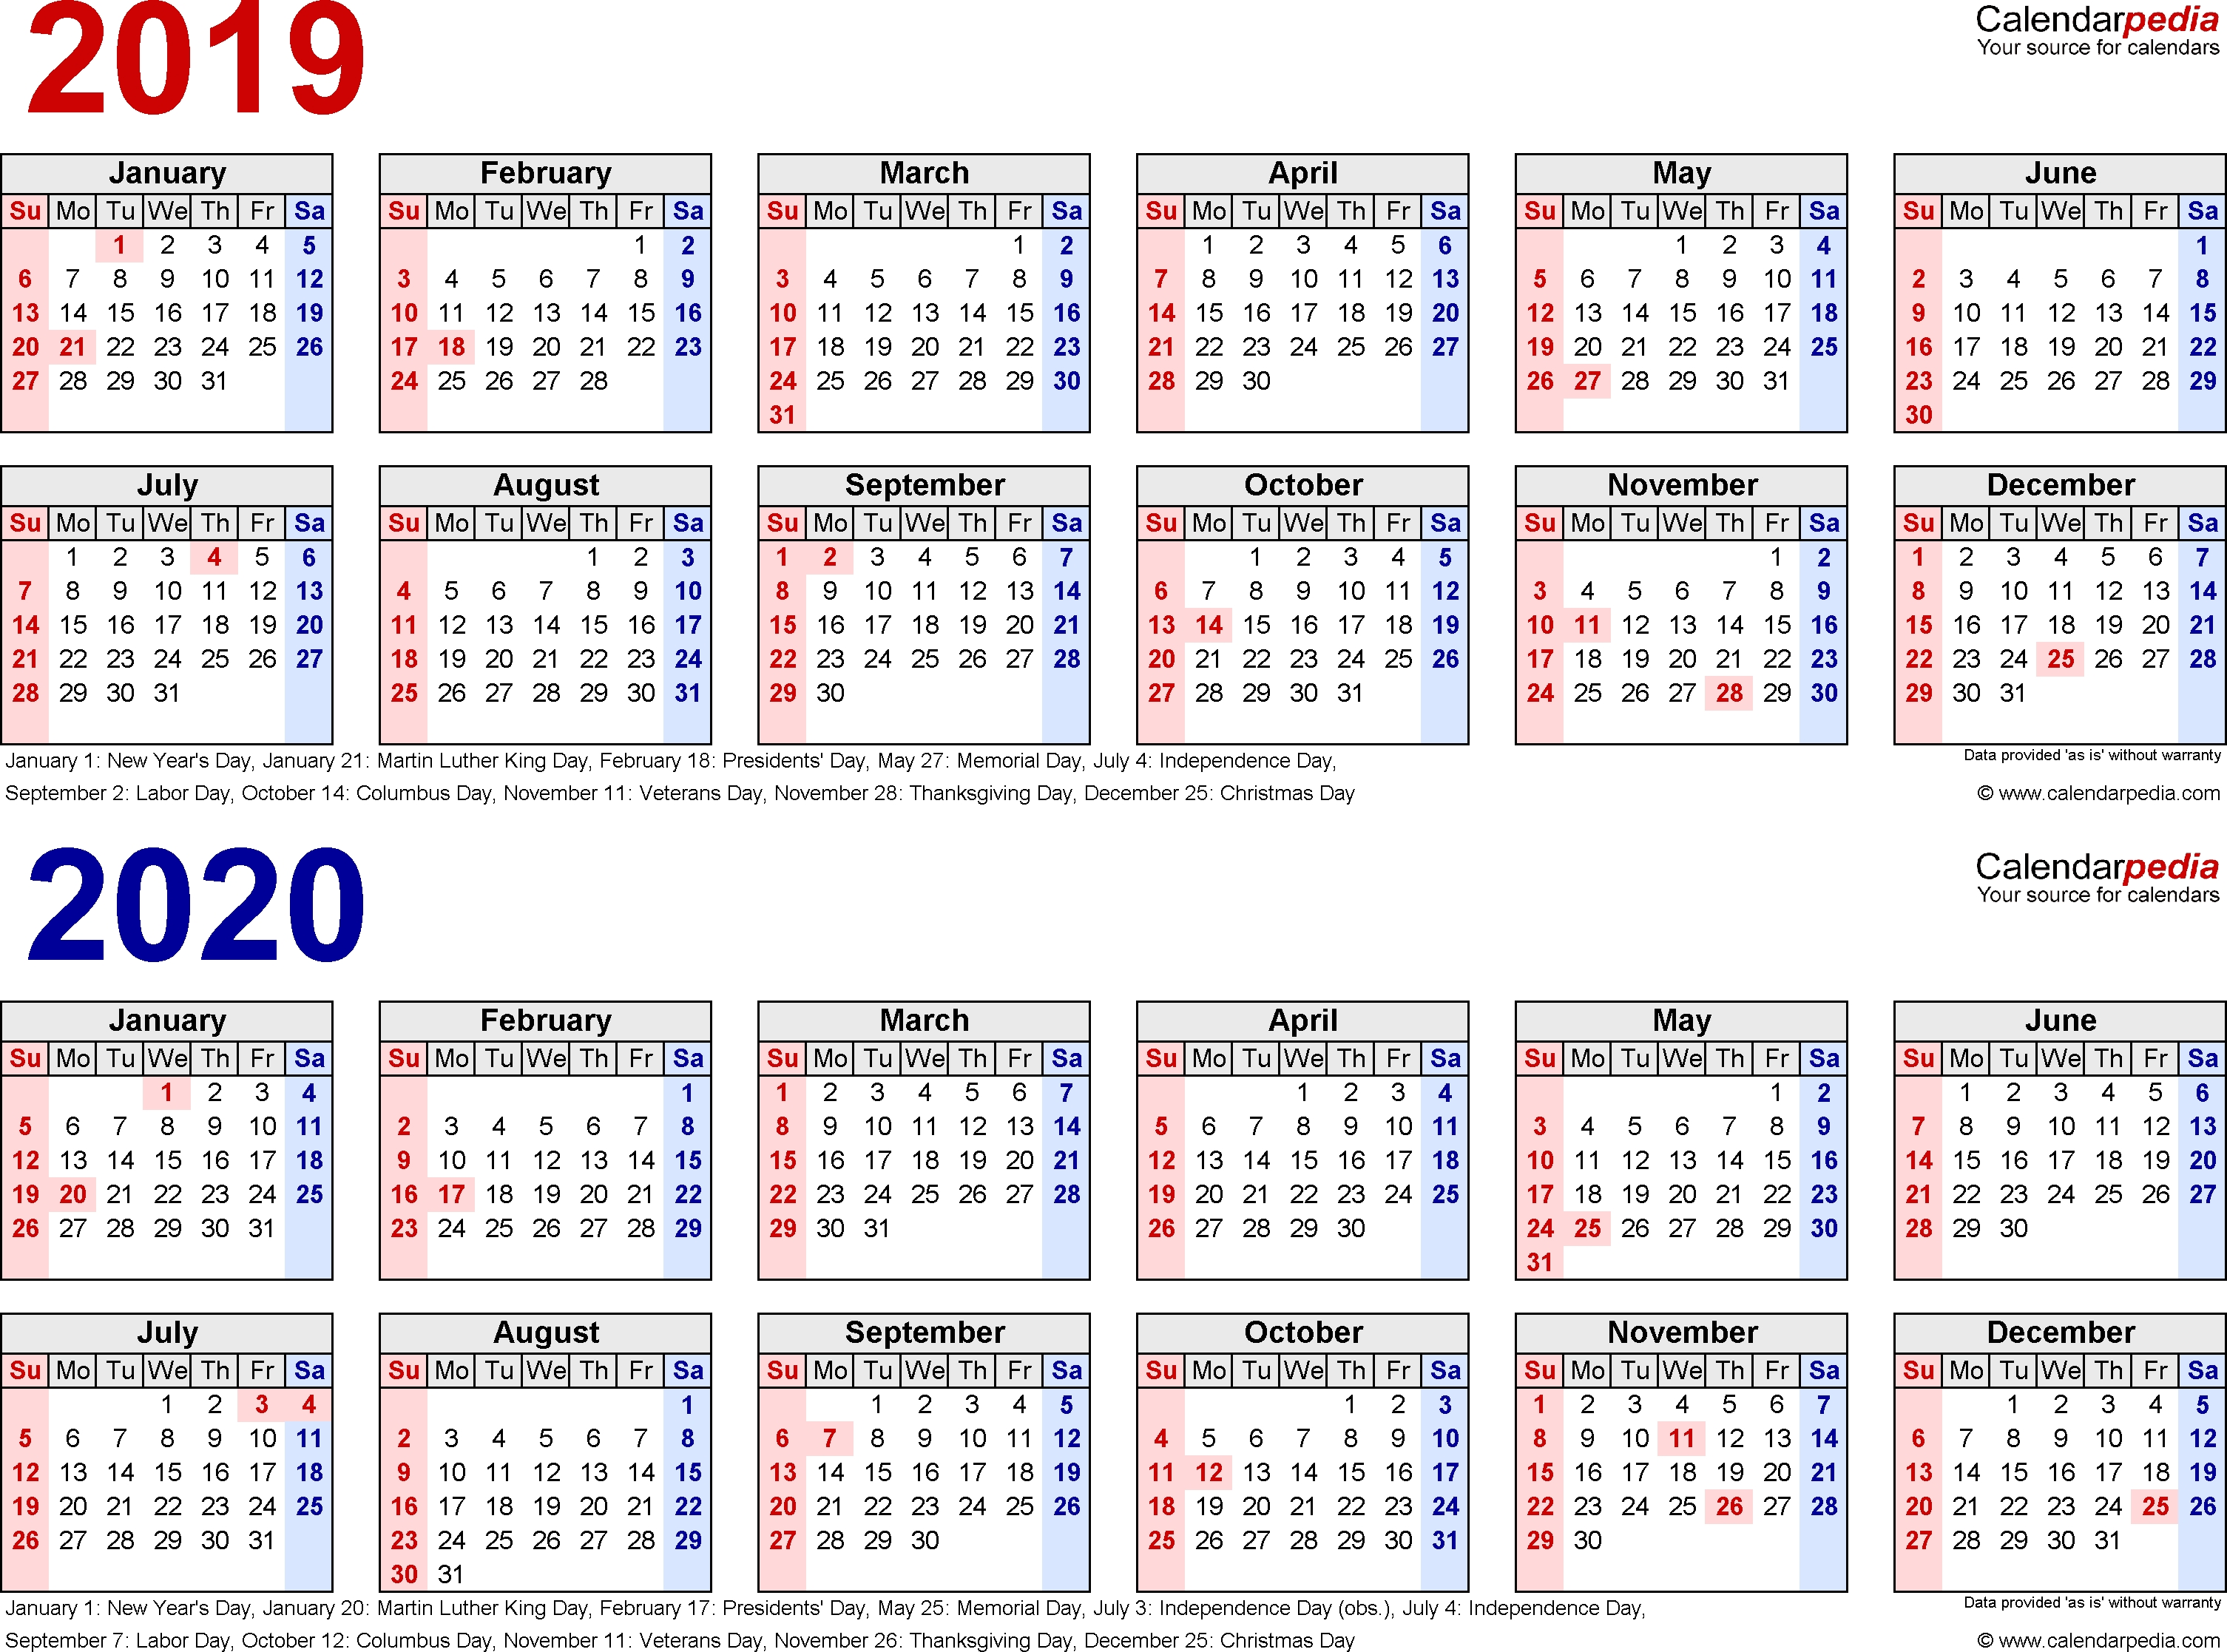 2019-2020 Calendar - Free Printable Two-Year Pdf Calendars within Calendar 365 2020 Printable